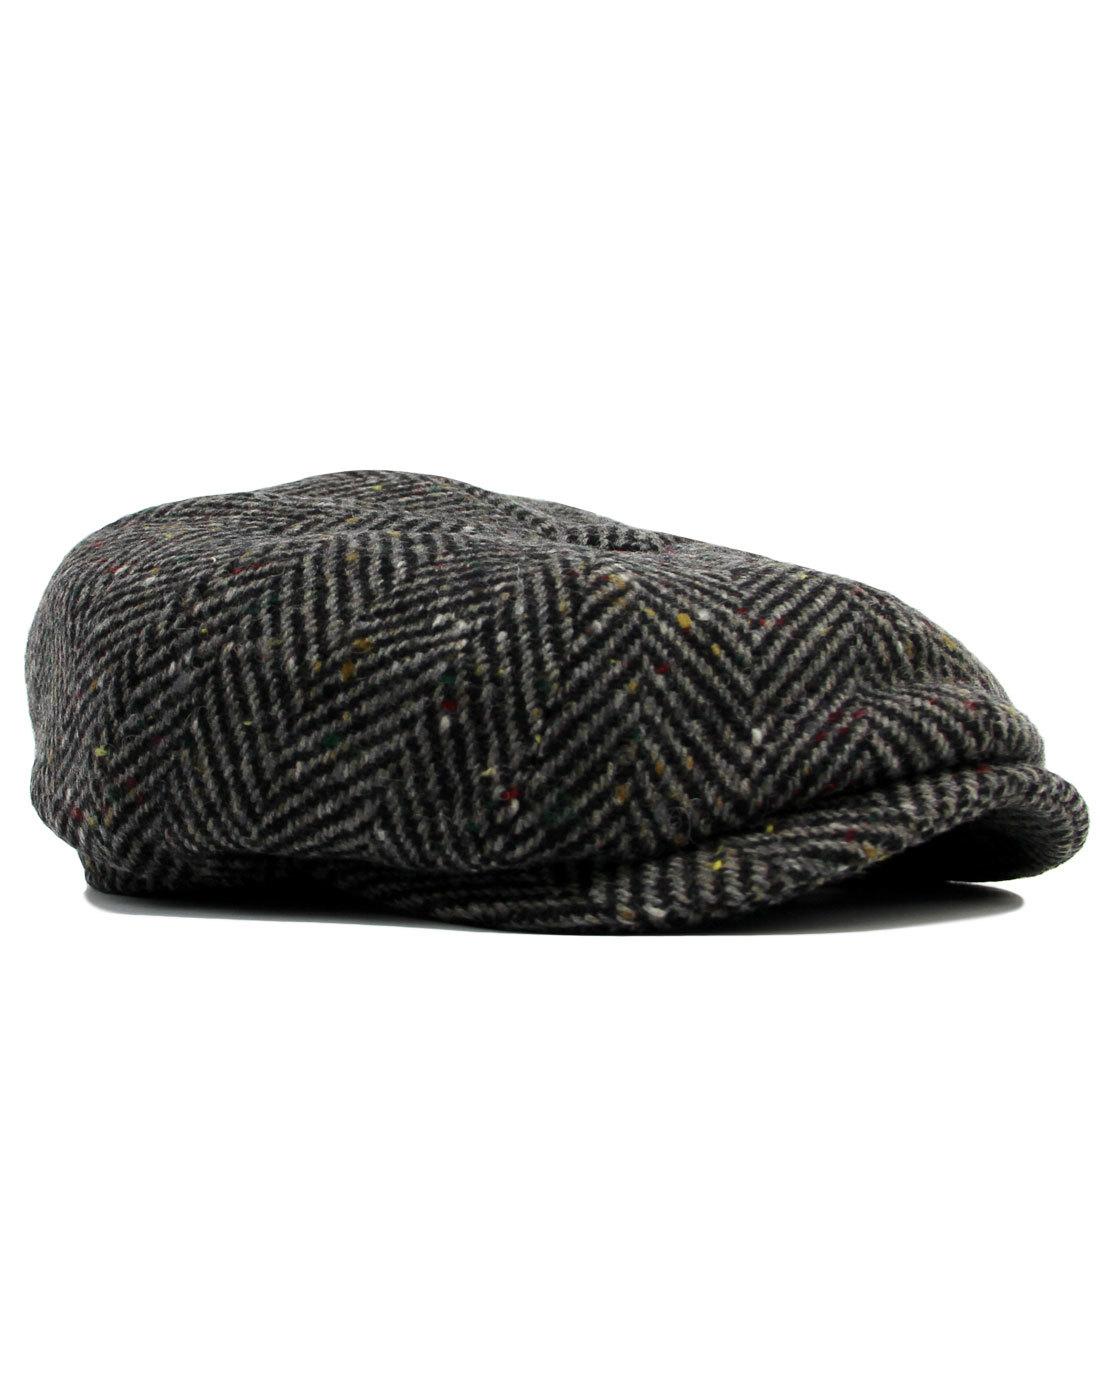 498881bfcef FAILSWORTH Donegal Mayo 1960s Mod Magee Herringbone Gatsby Cap